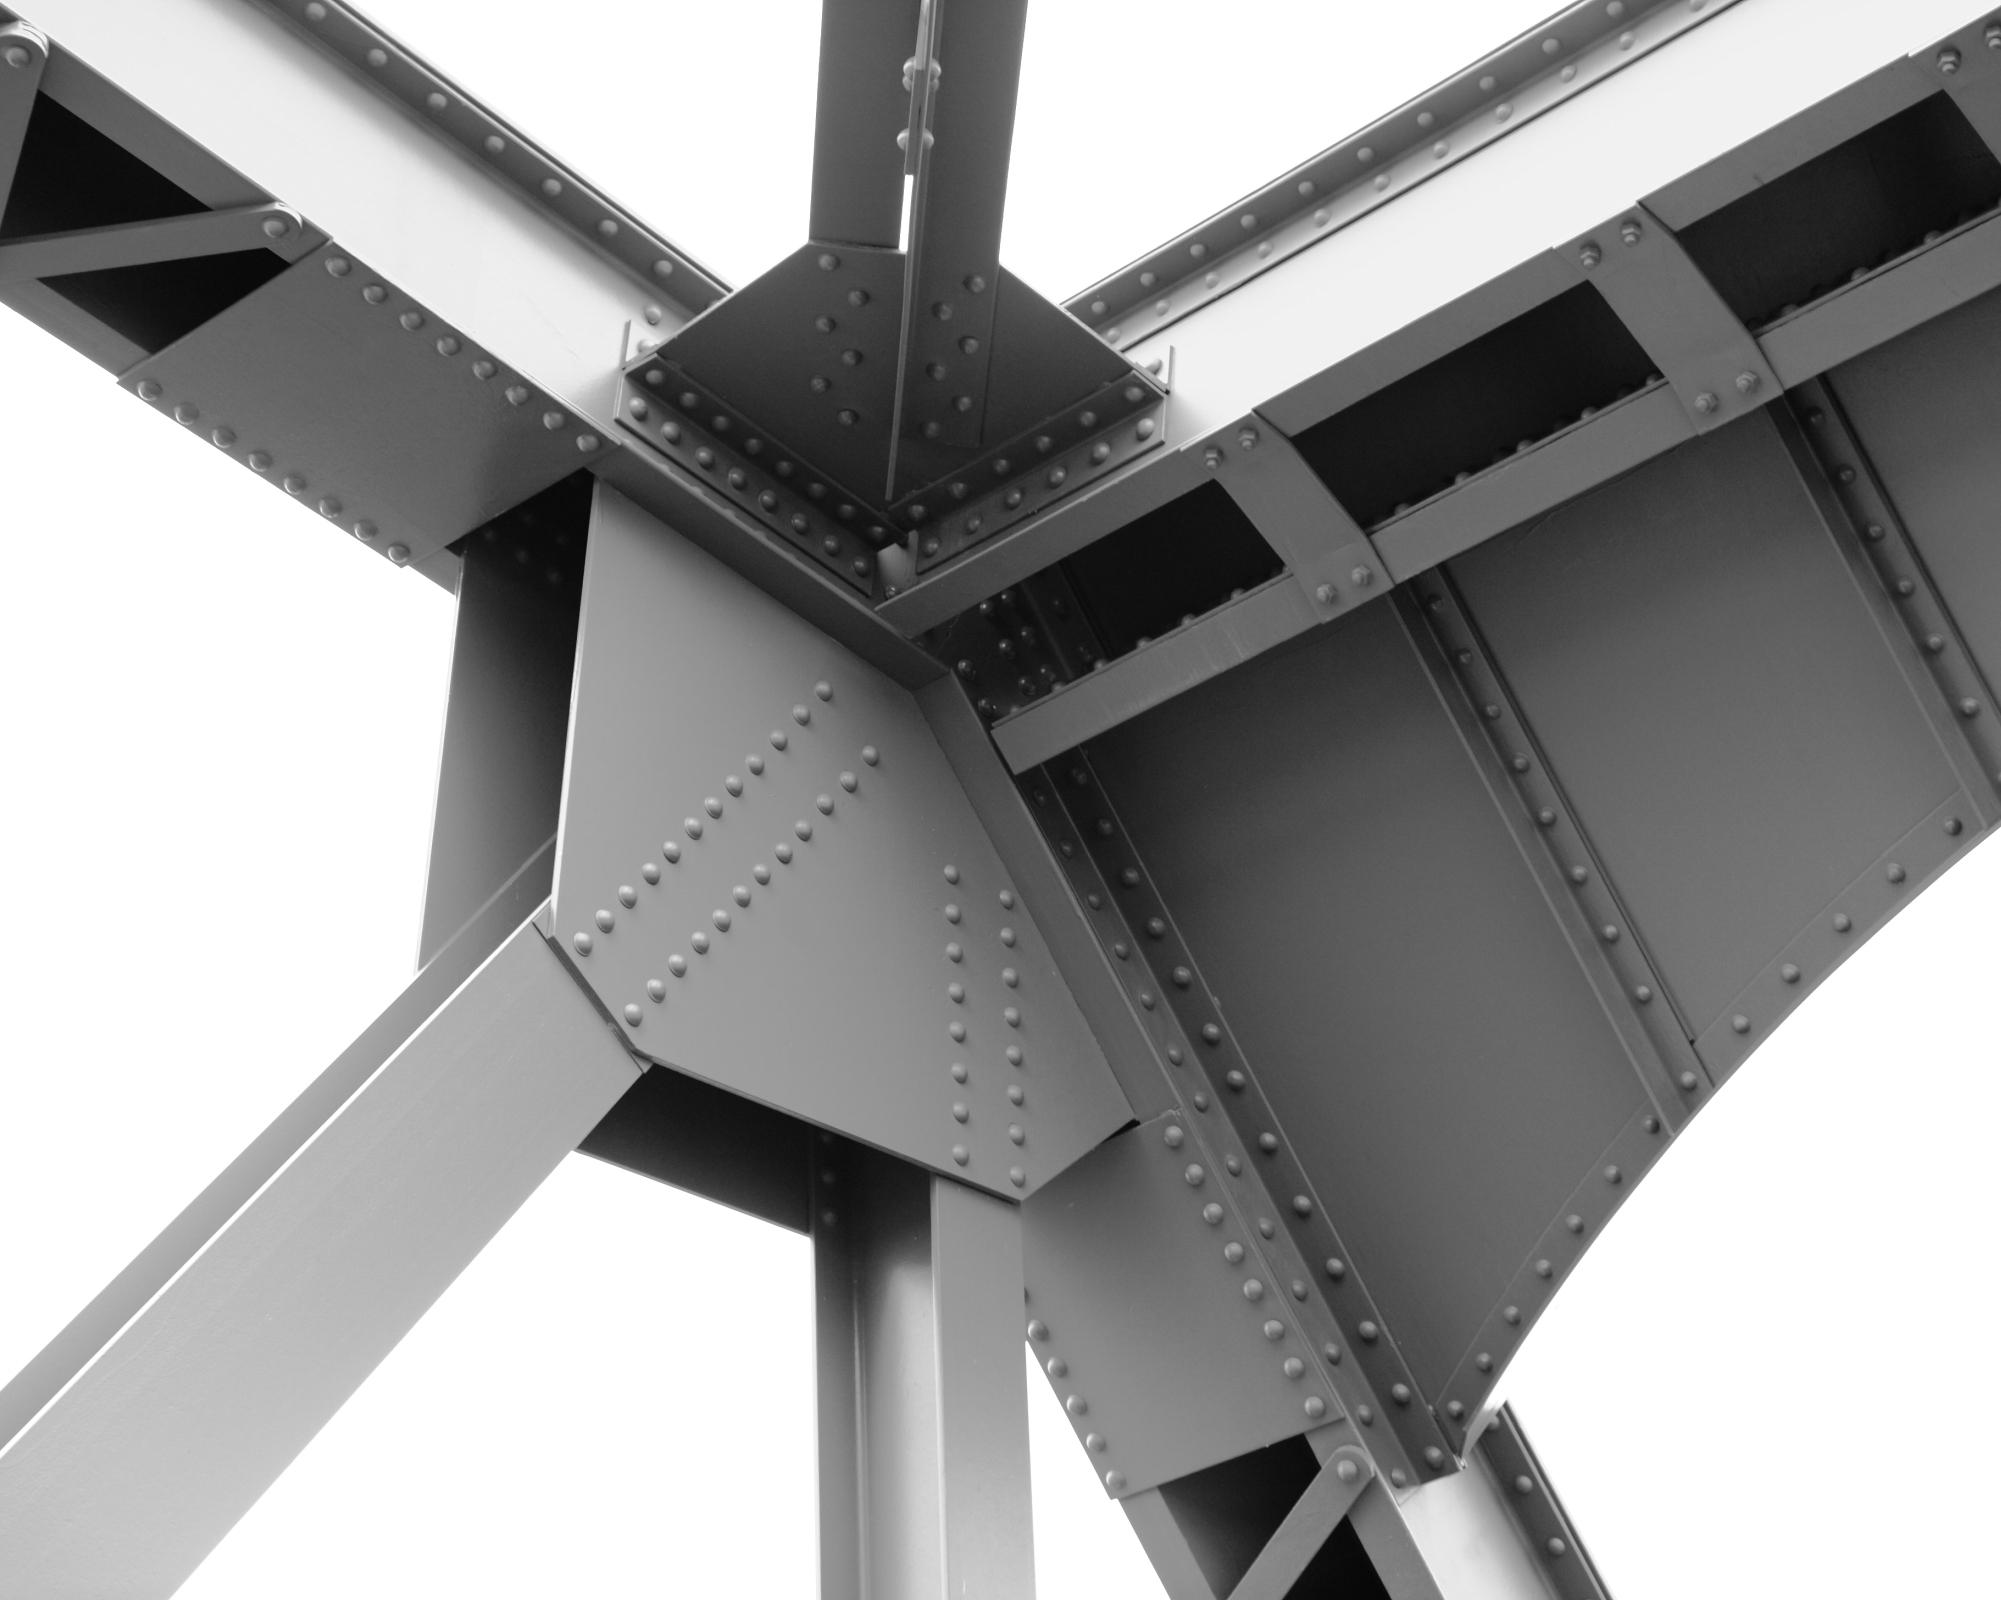 Lowry Avenue Bridge - HE-MPC-8351-13 (Please credit Daniel R. Pratt and the Minnesota Historic Property Record)